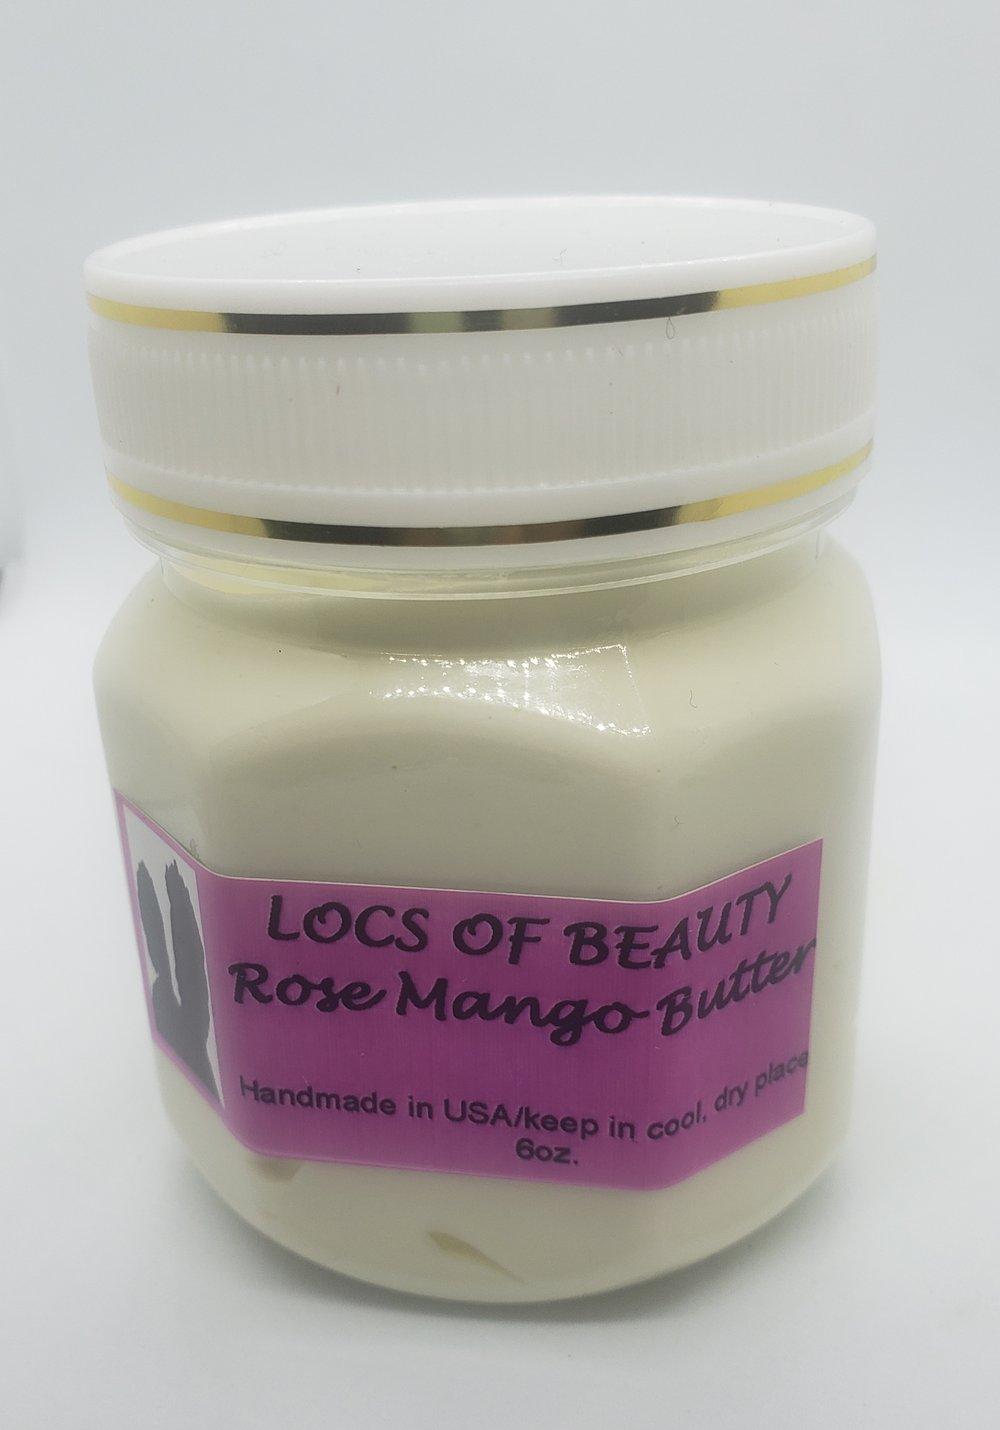 Image of Rose mango butter